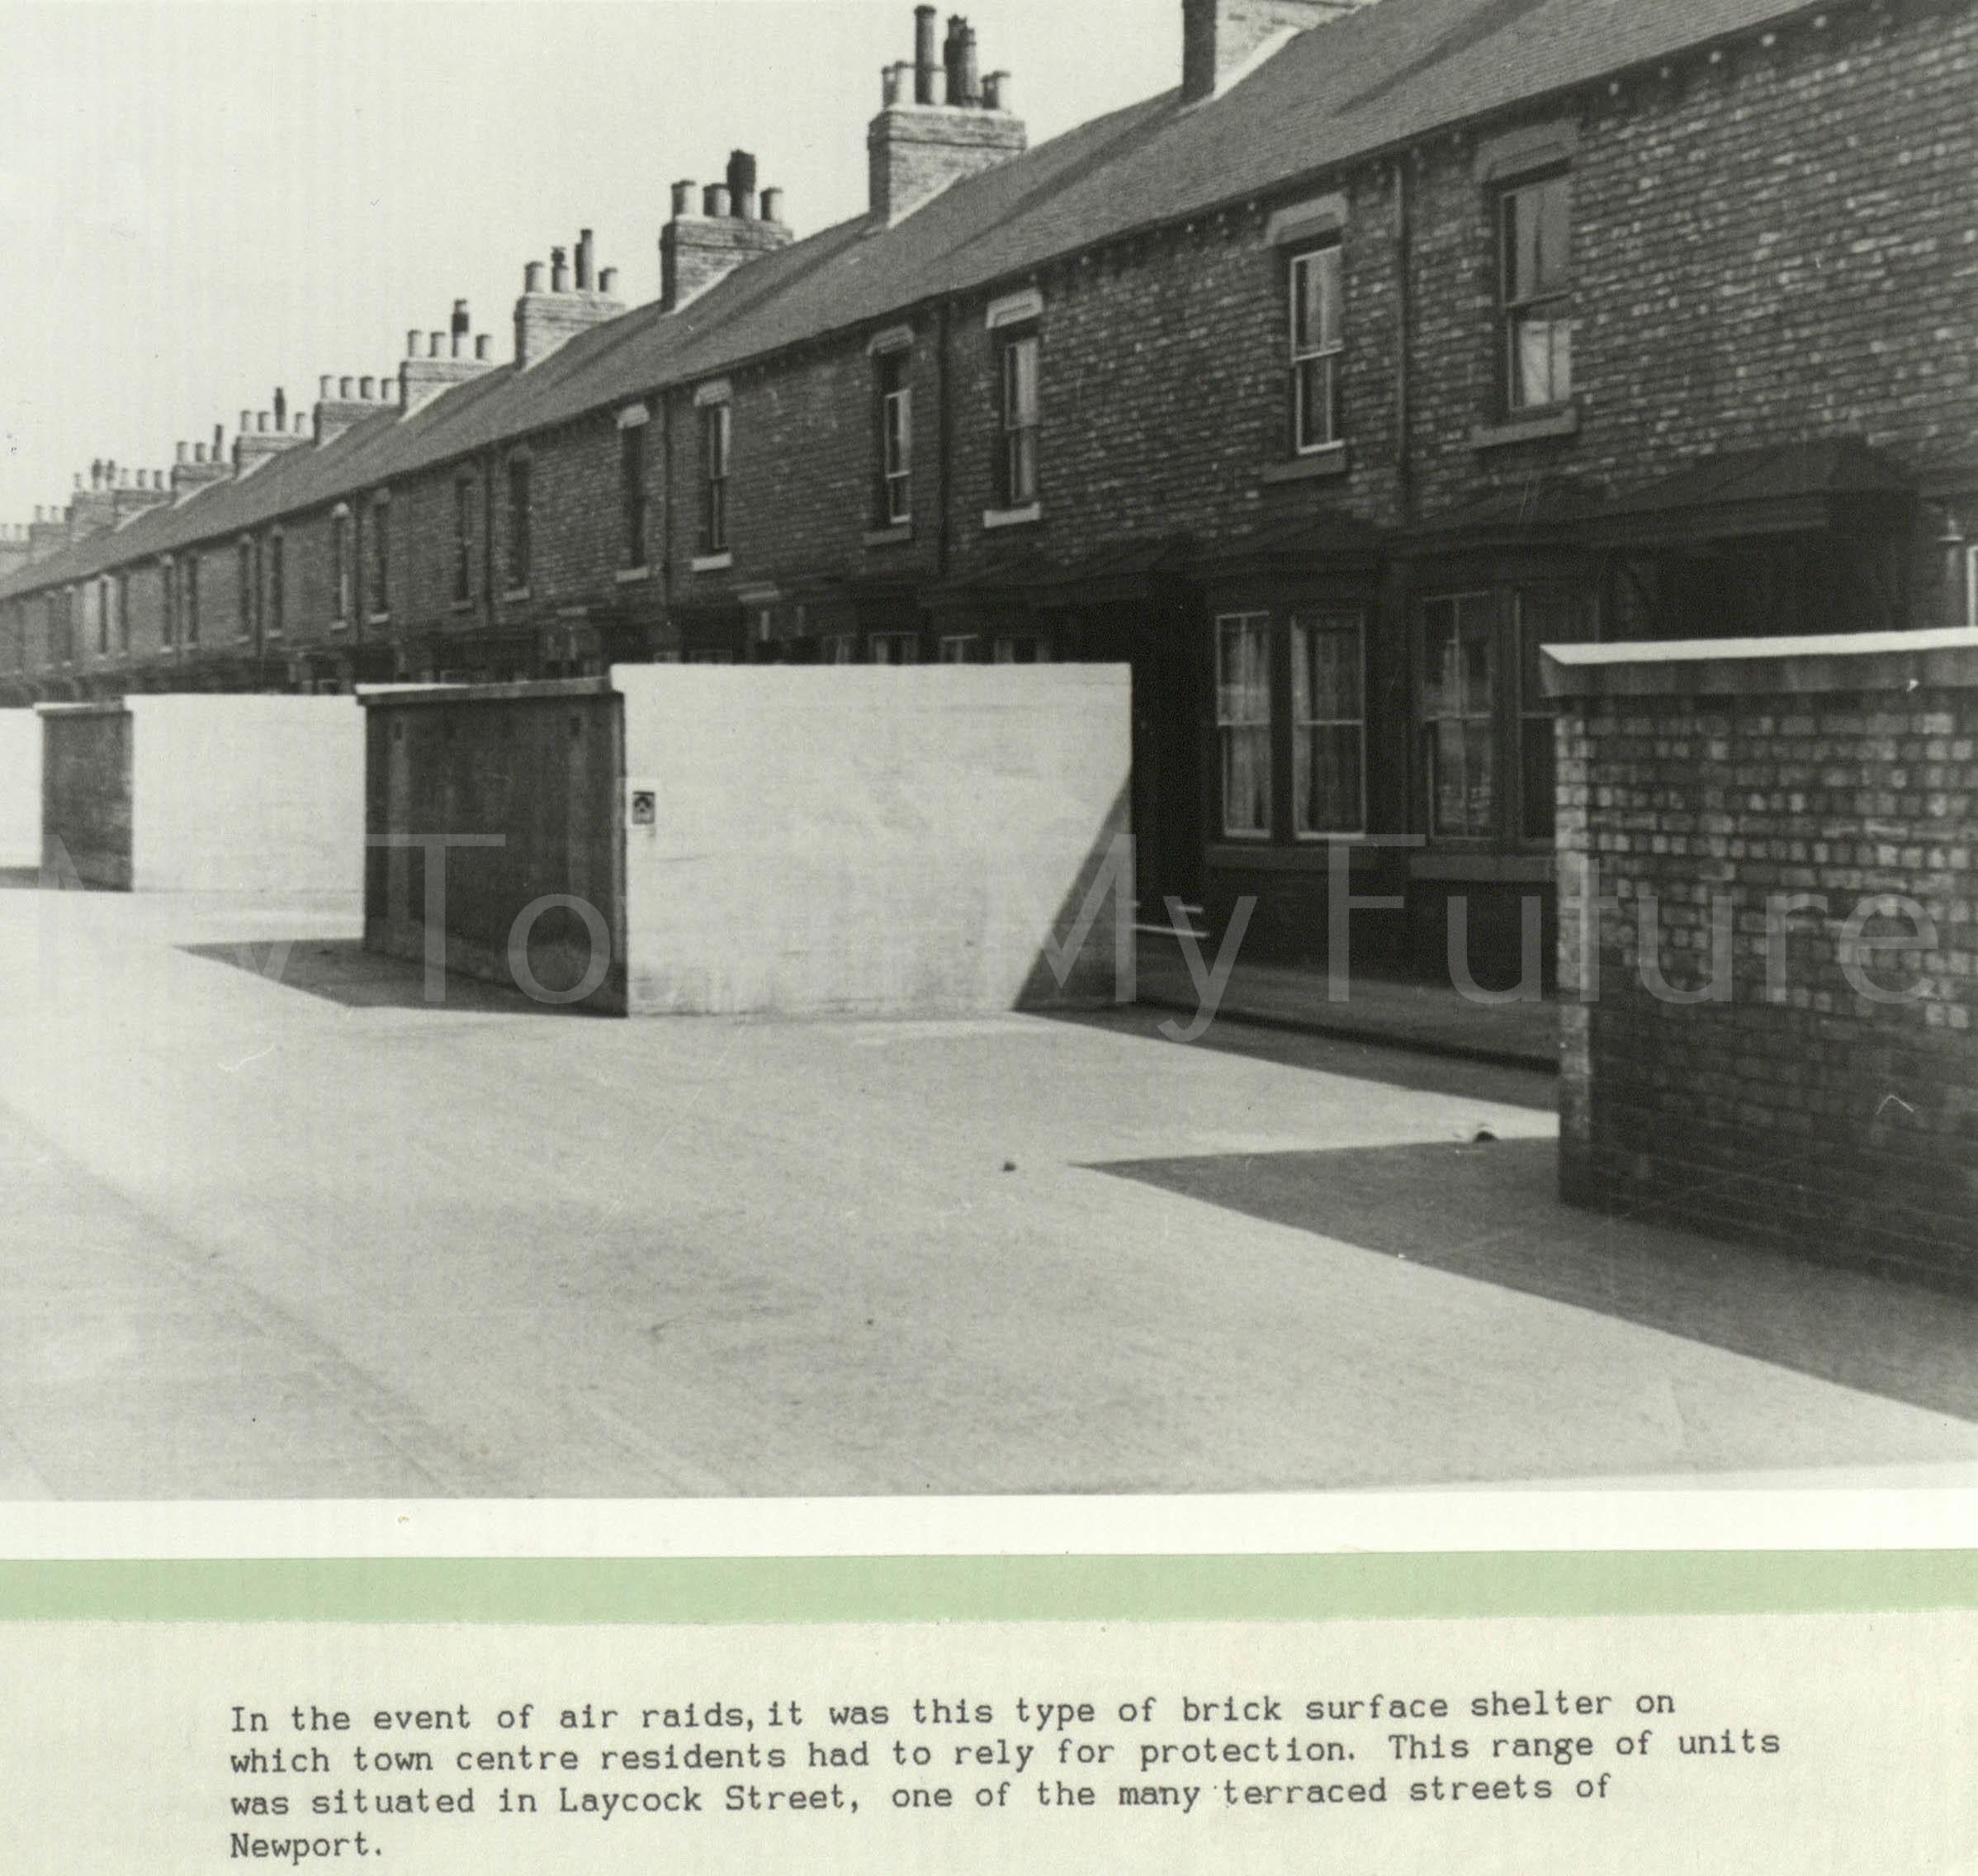 World War II,Brick Surface Shelters,Laycock Street